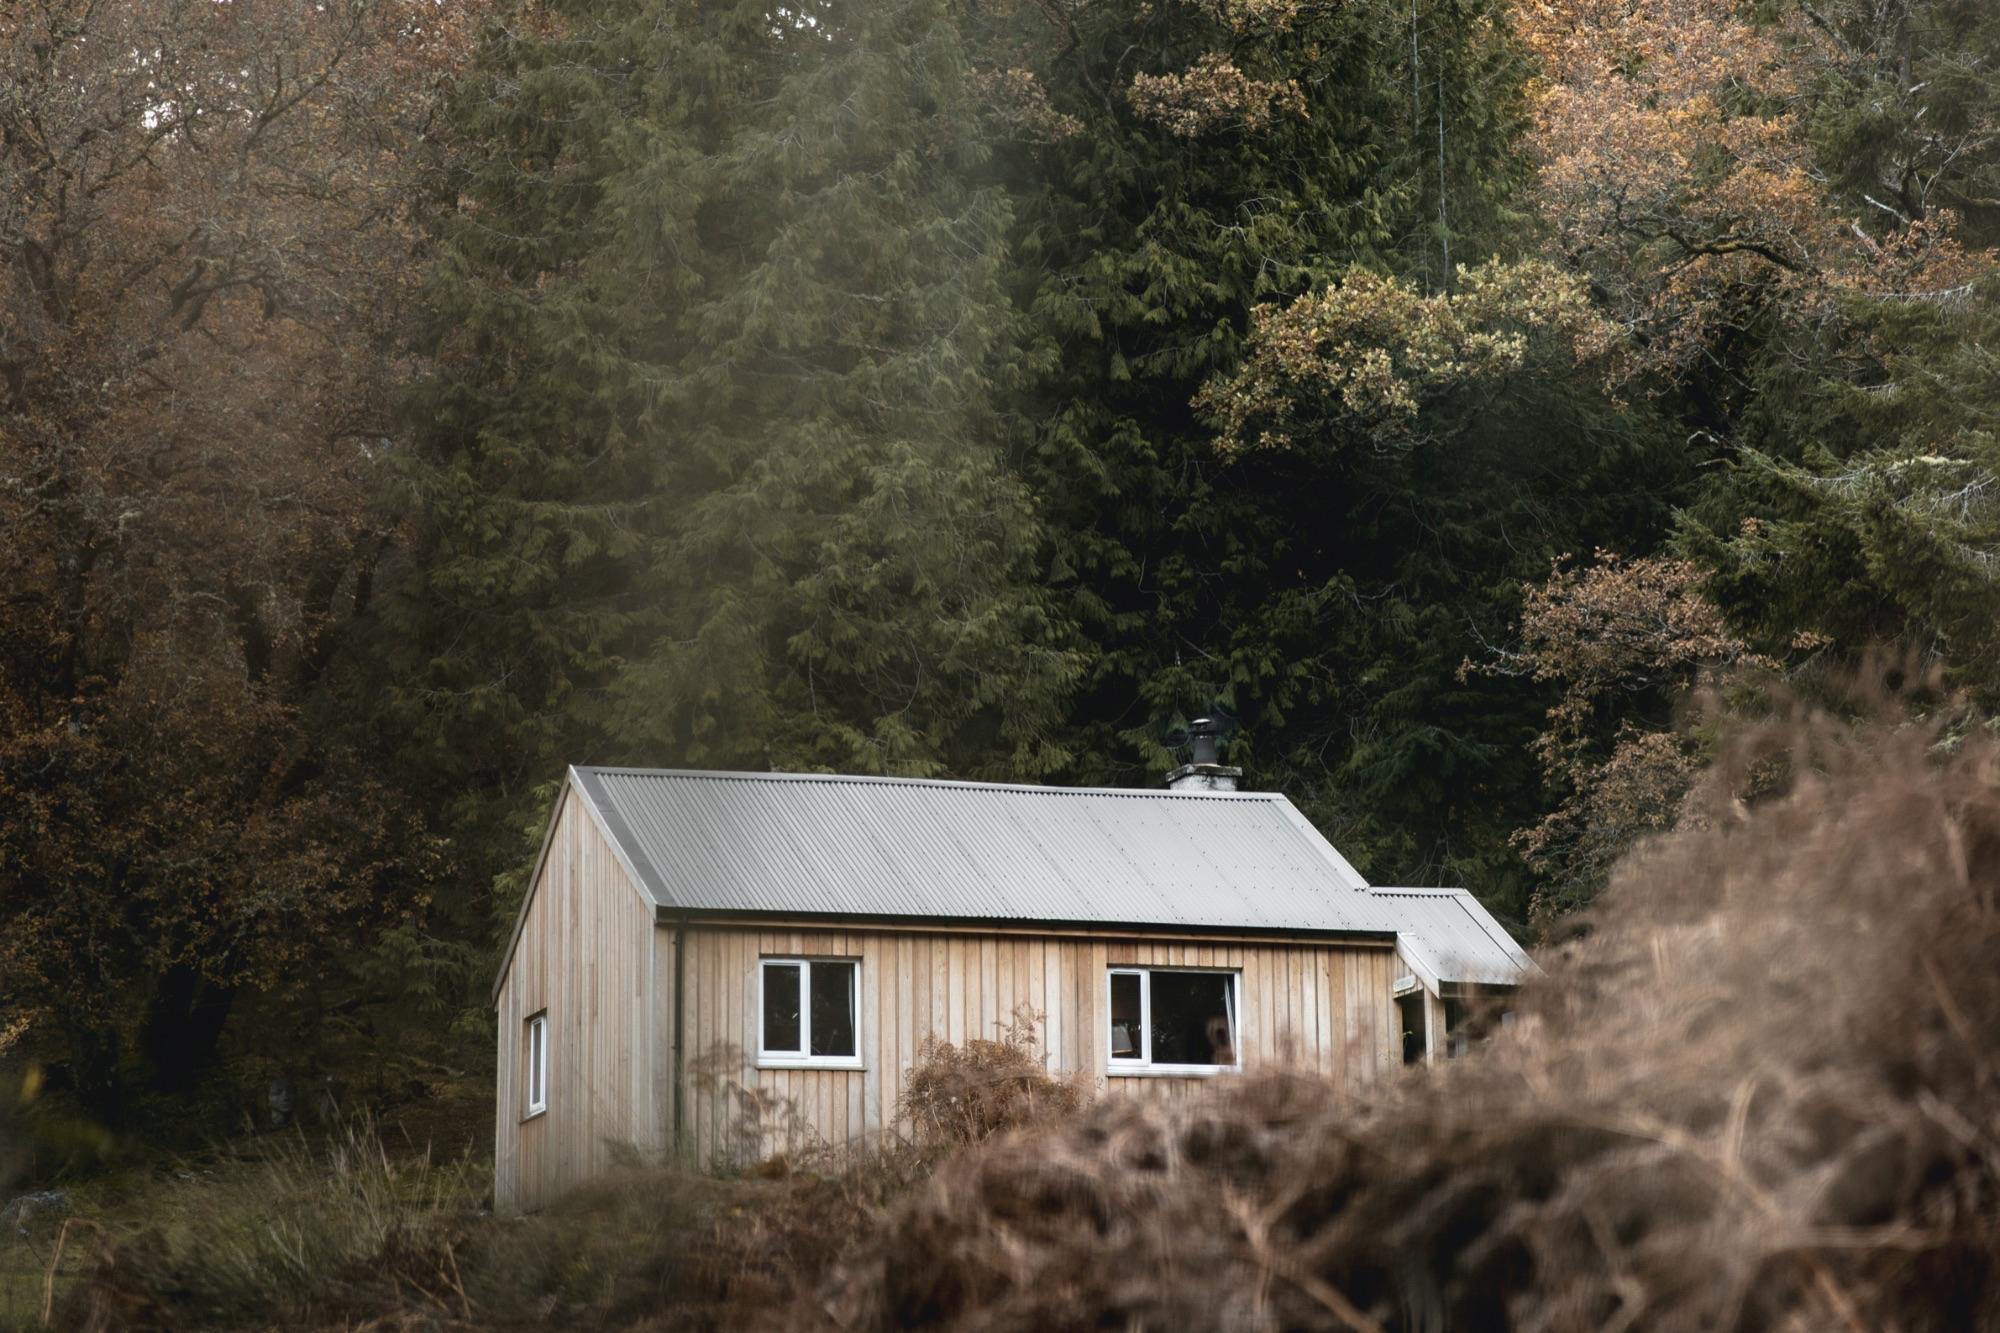 Timber Cottage on the Scottish island of Eilean Shona